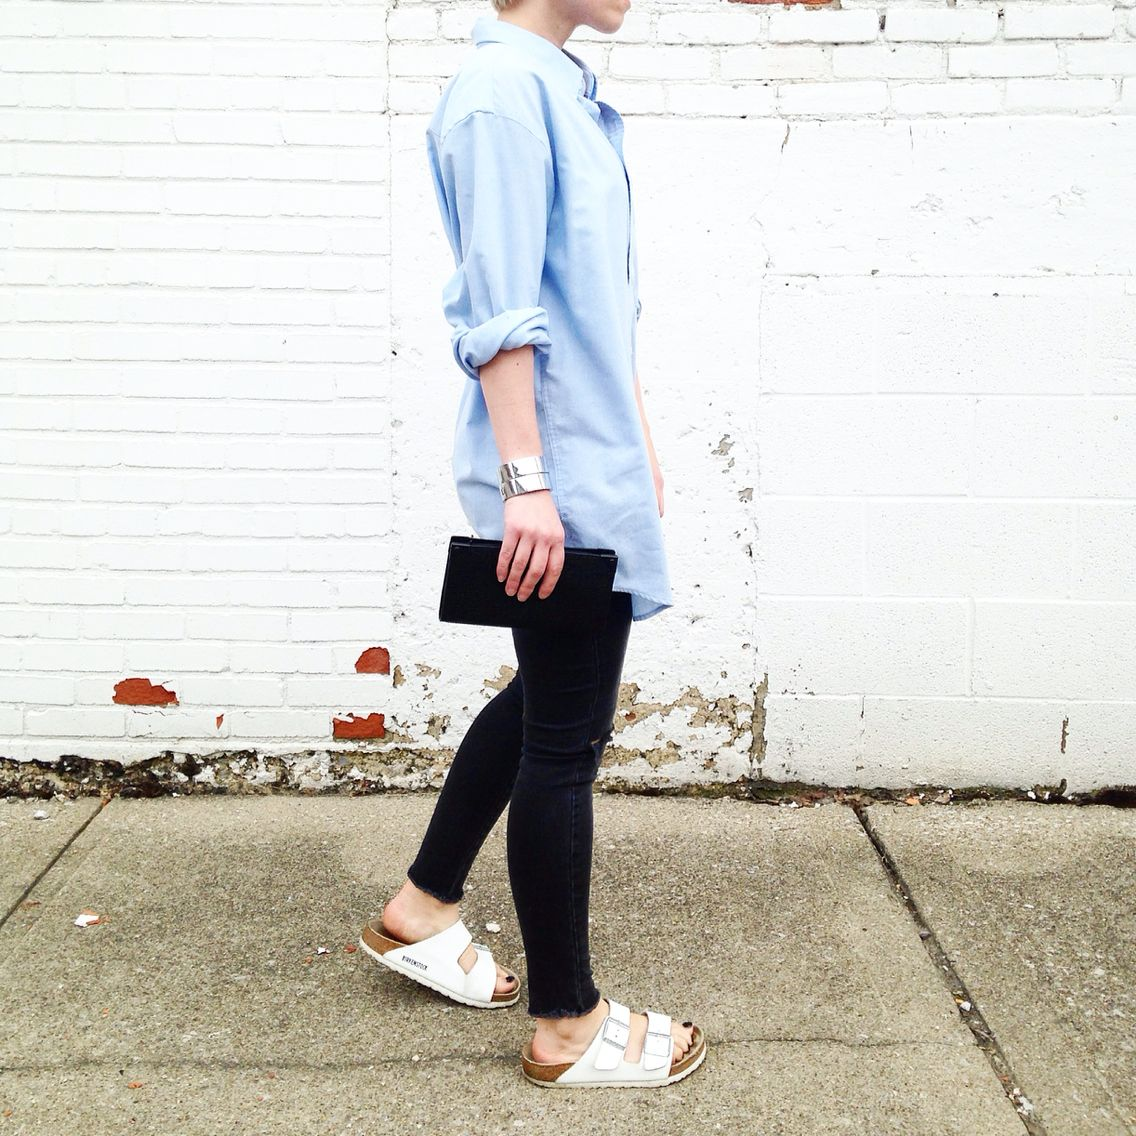 Birkenstock outfit, Birkenstock outfit